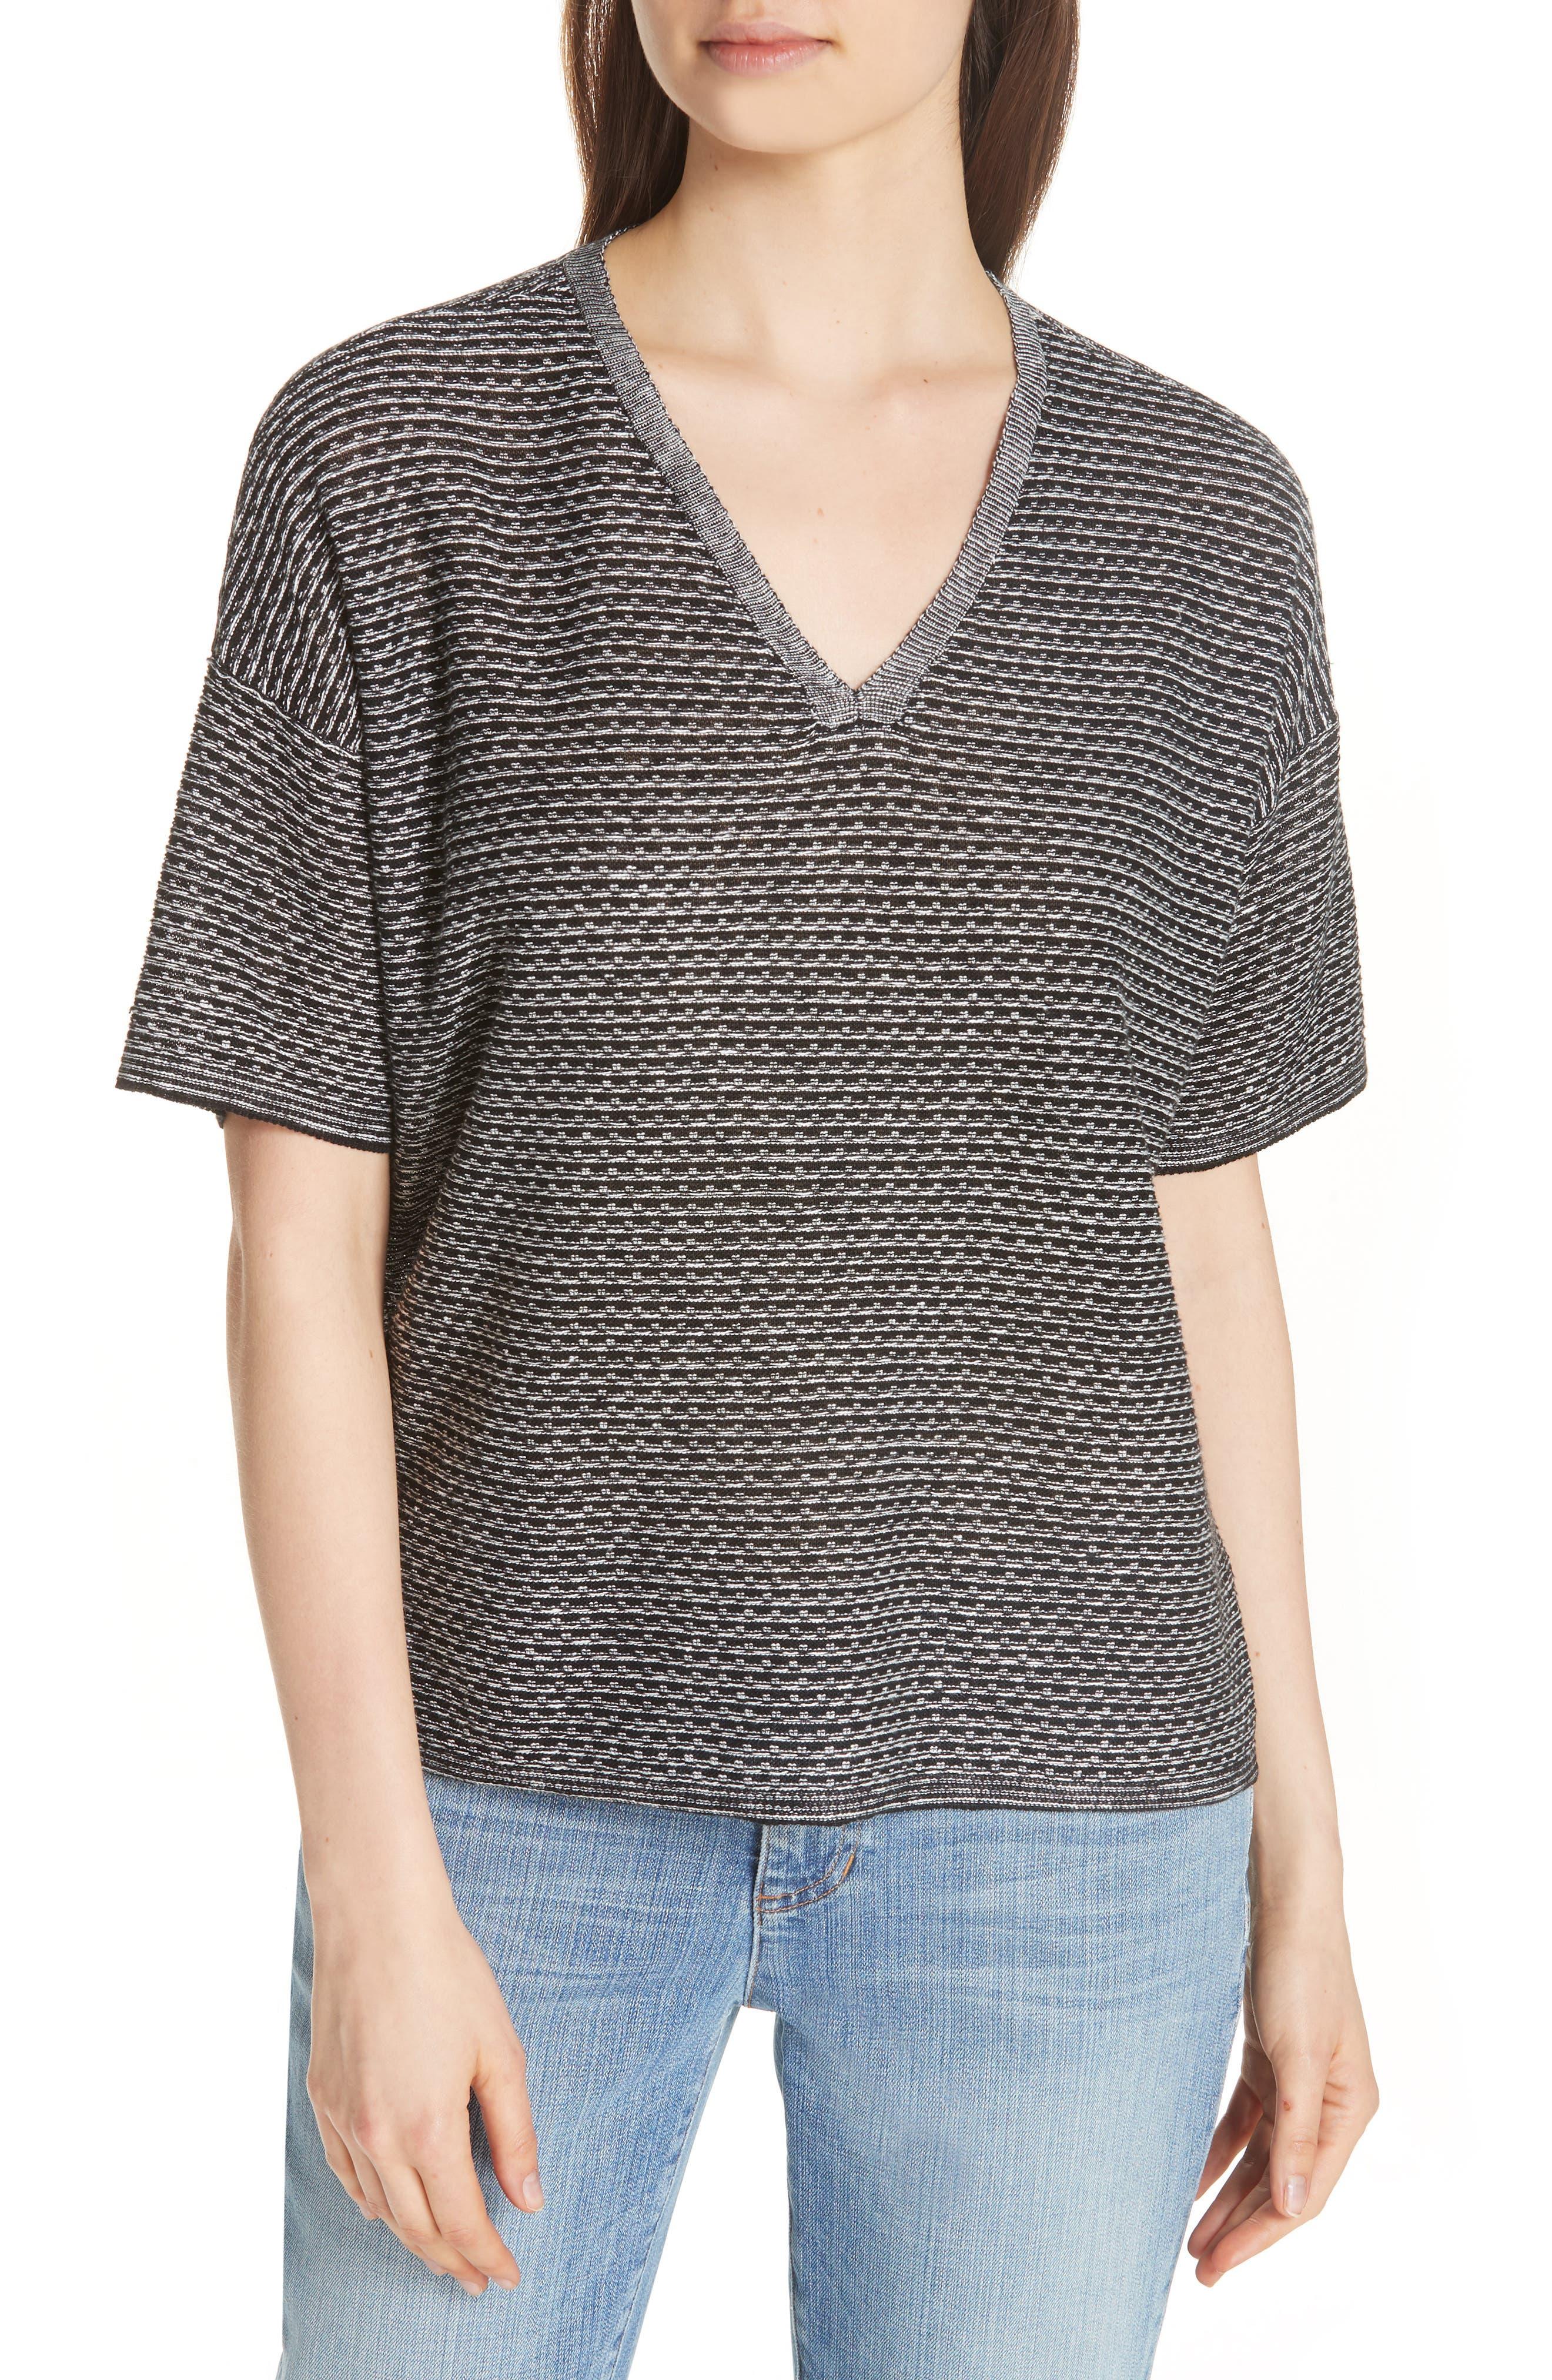 Organic Linen Jacquard Sweater,                         Main,                         color, Black/ Soft White